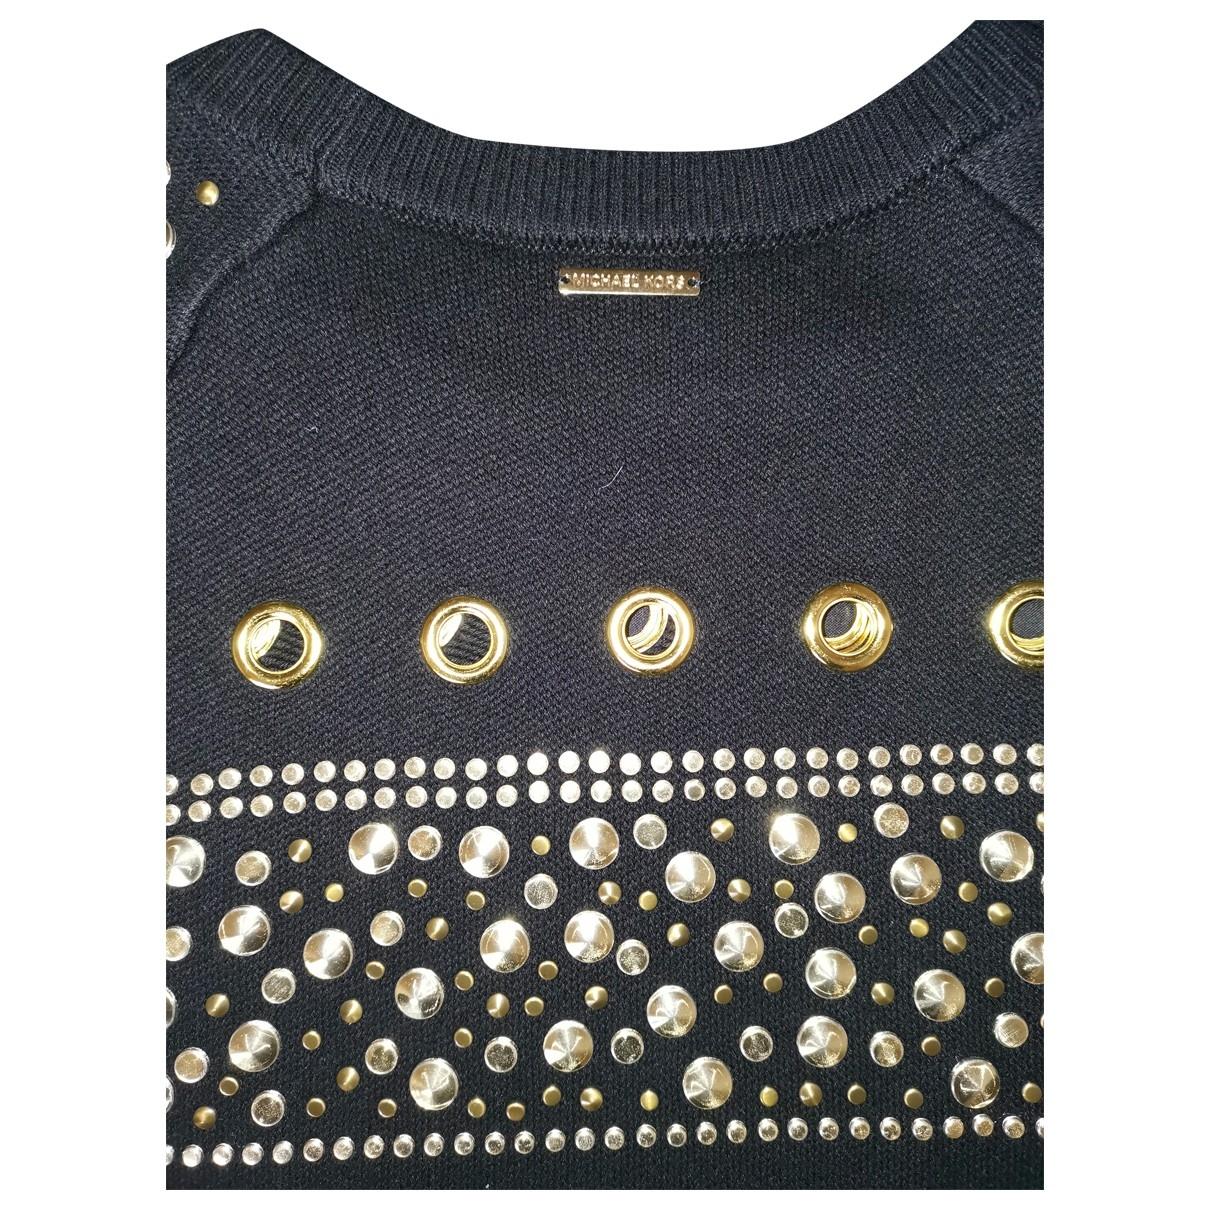 Michael Kors \N Black Cotton Knitwear for Women XS International